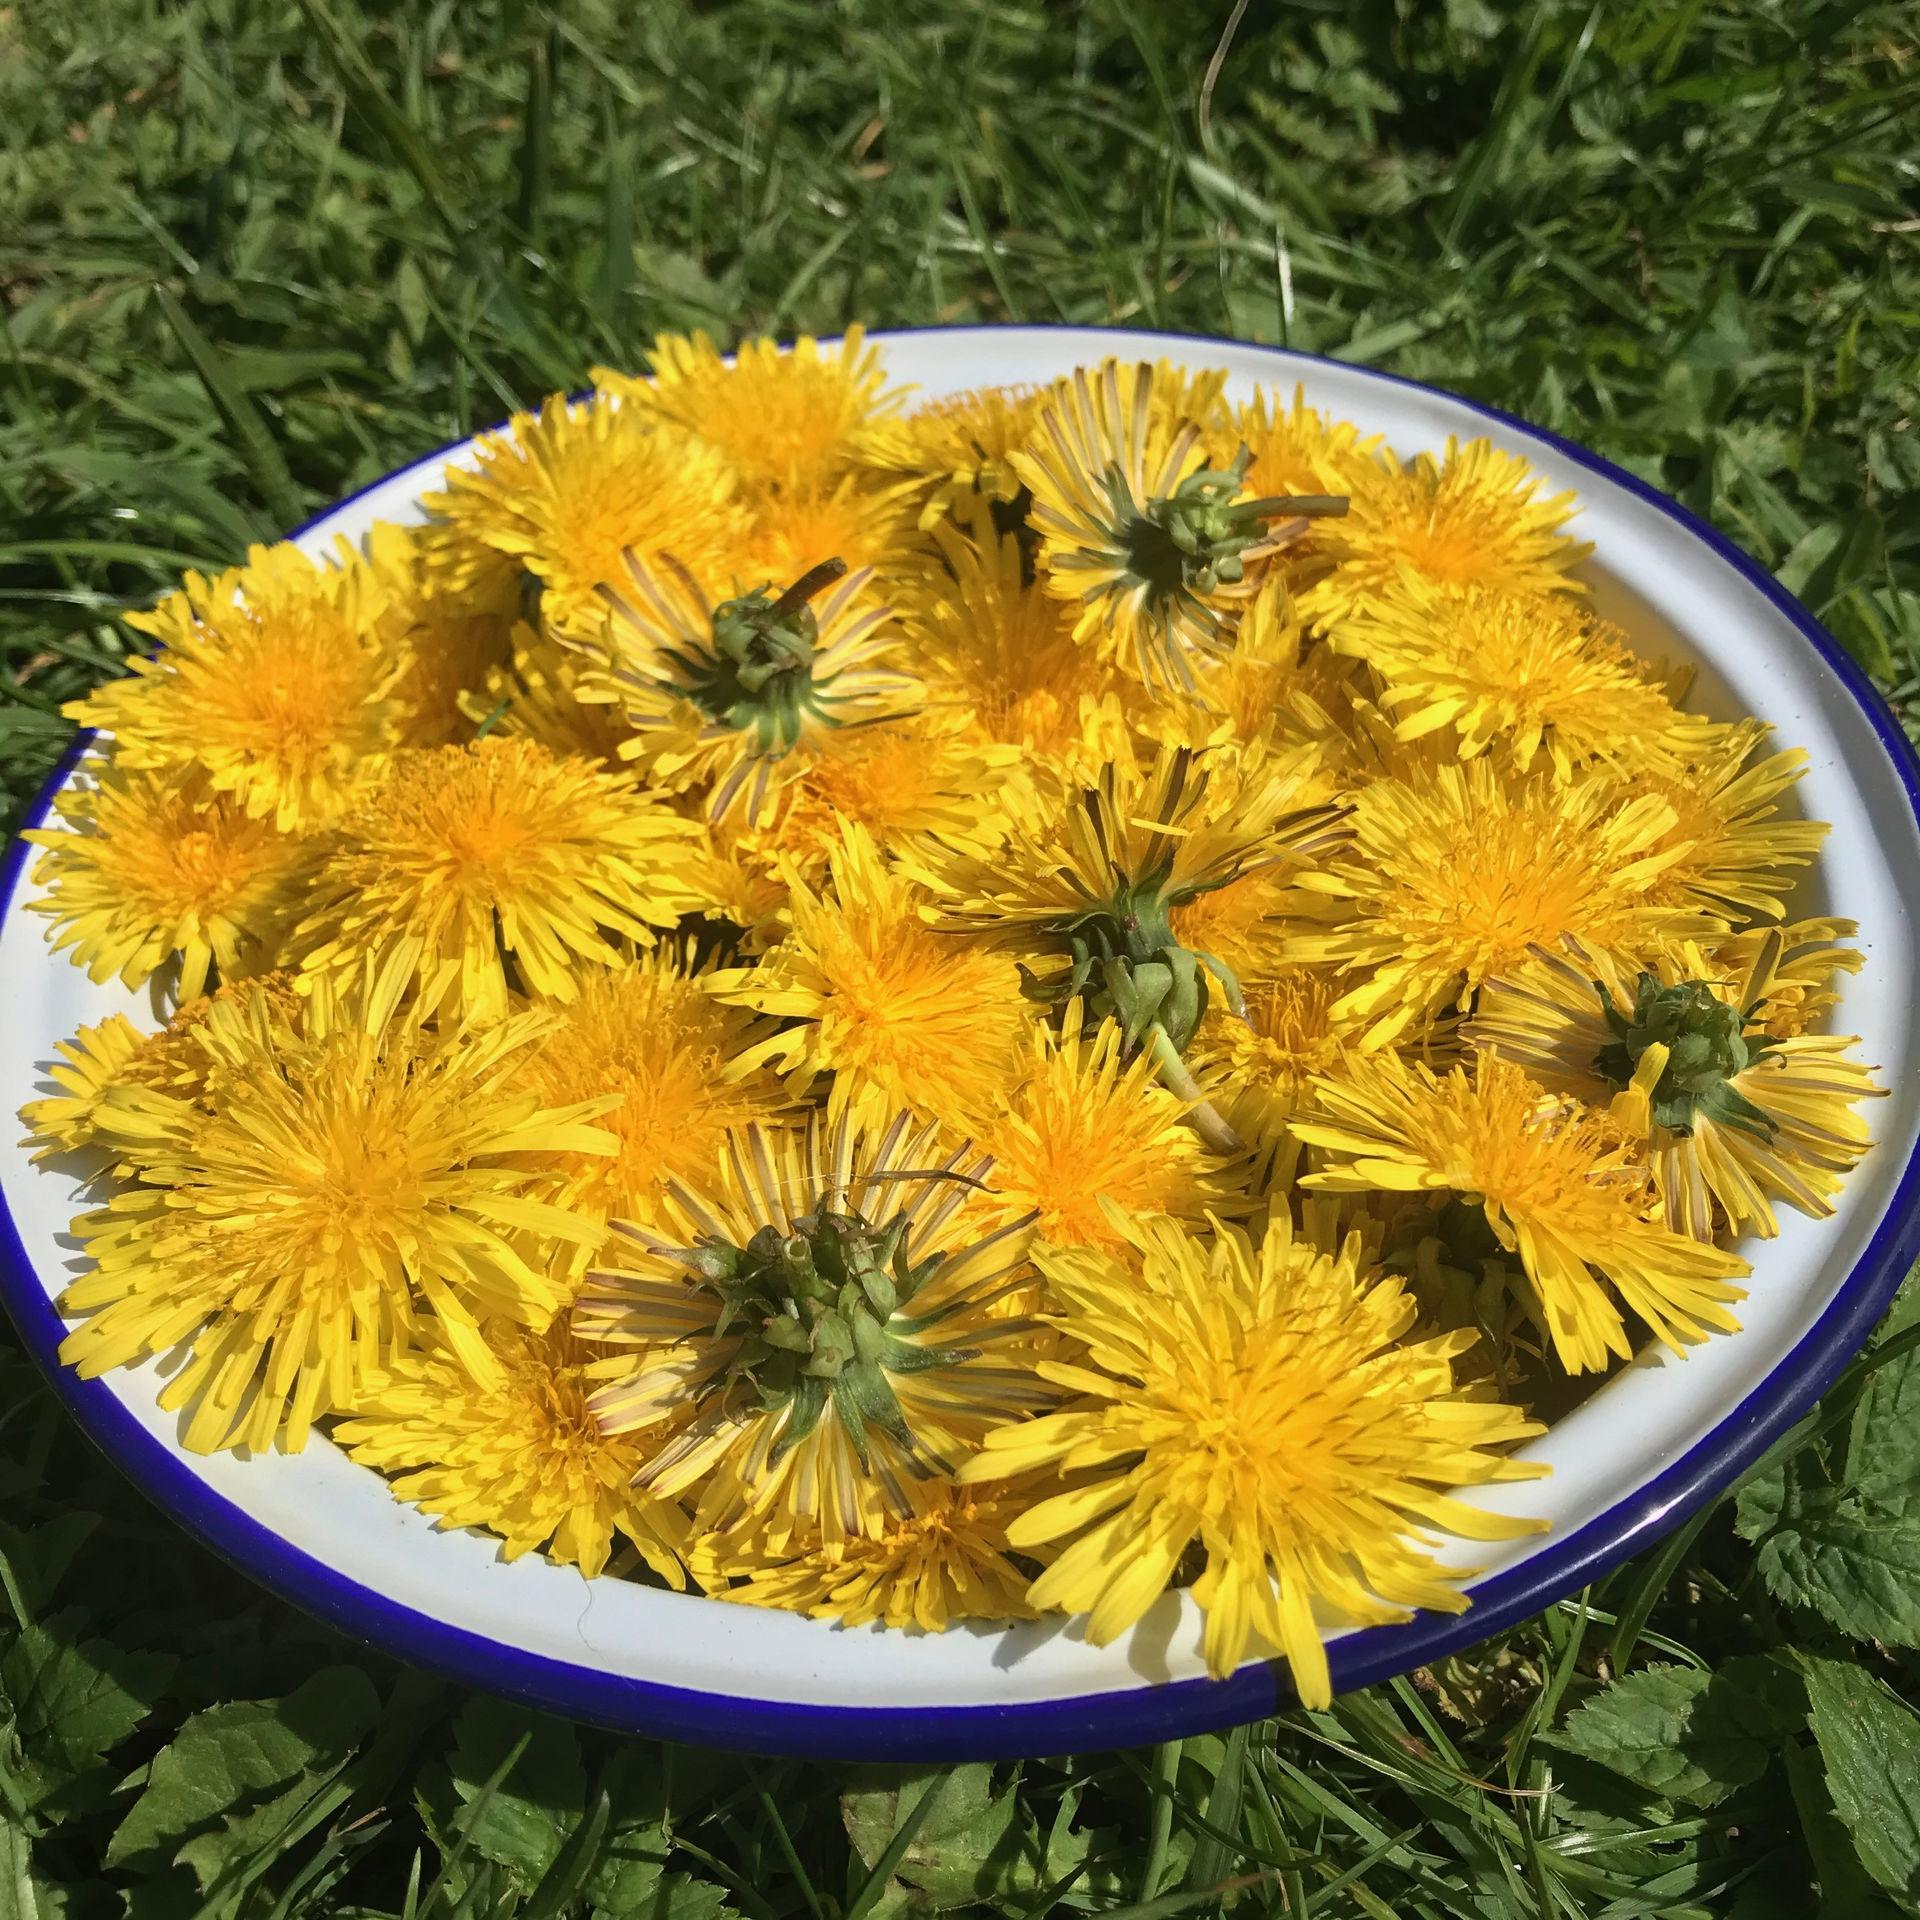 zero-waste-recipe-dandelion-syrup-img-9250.jpg